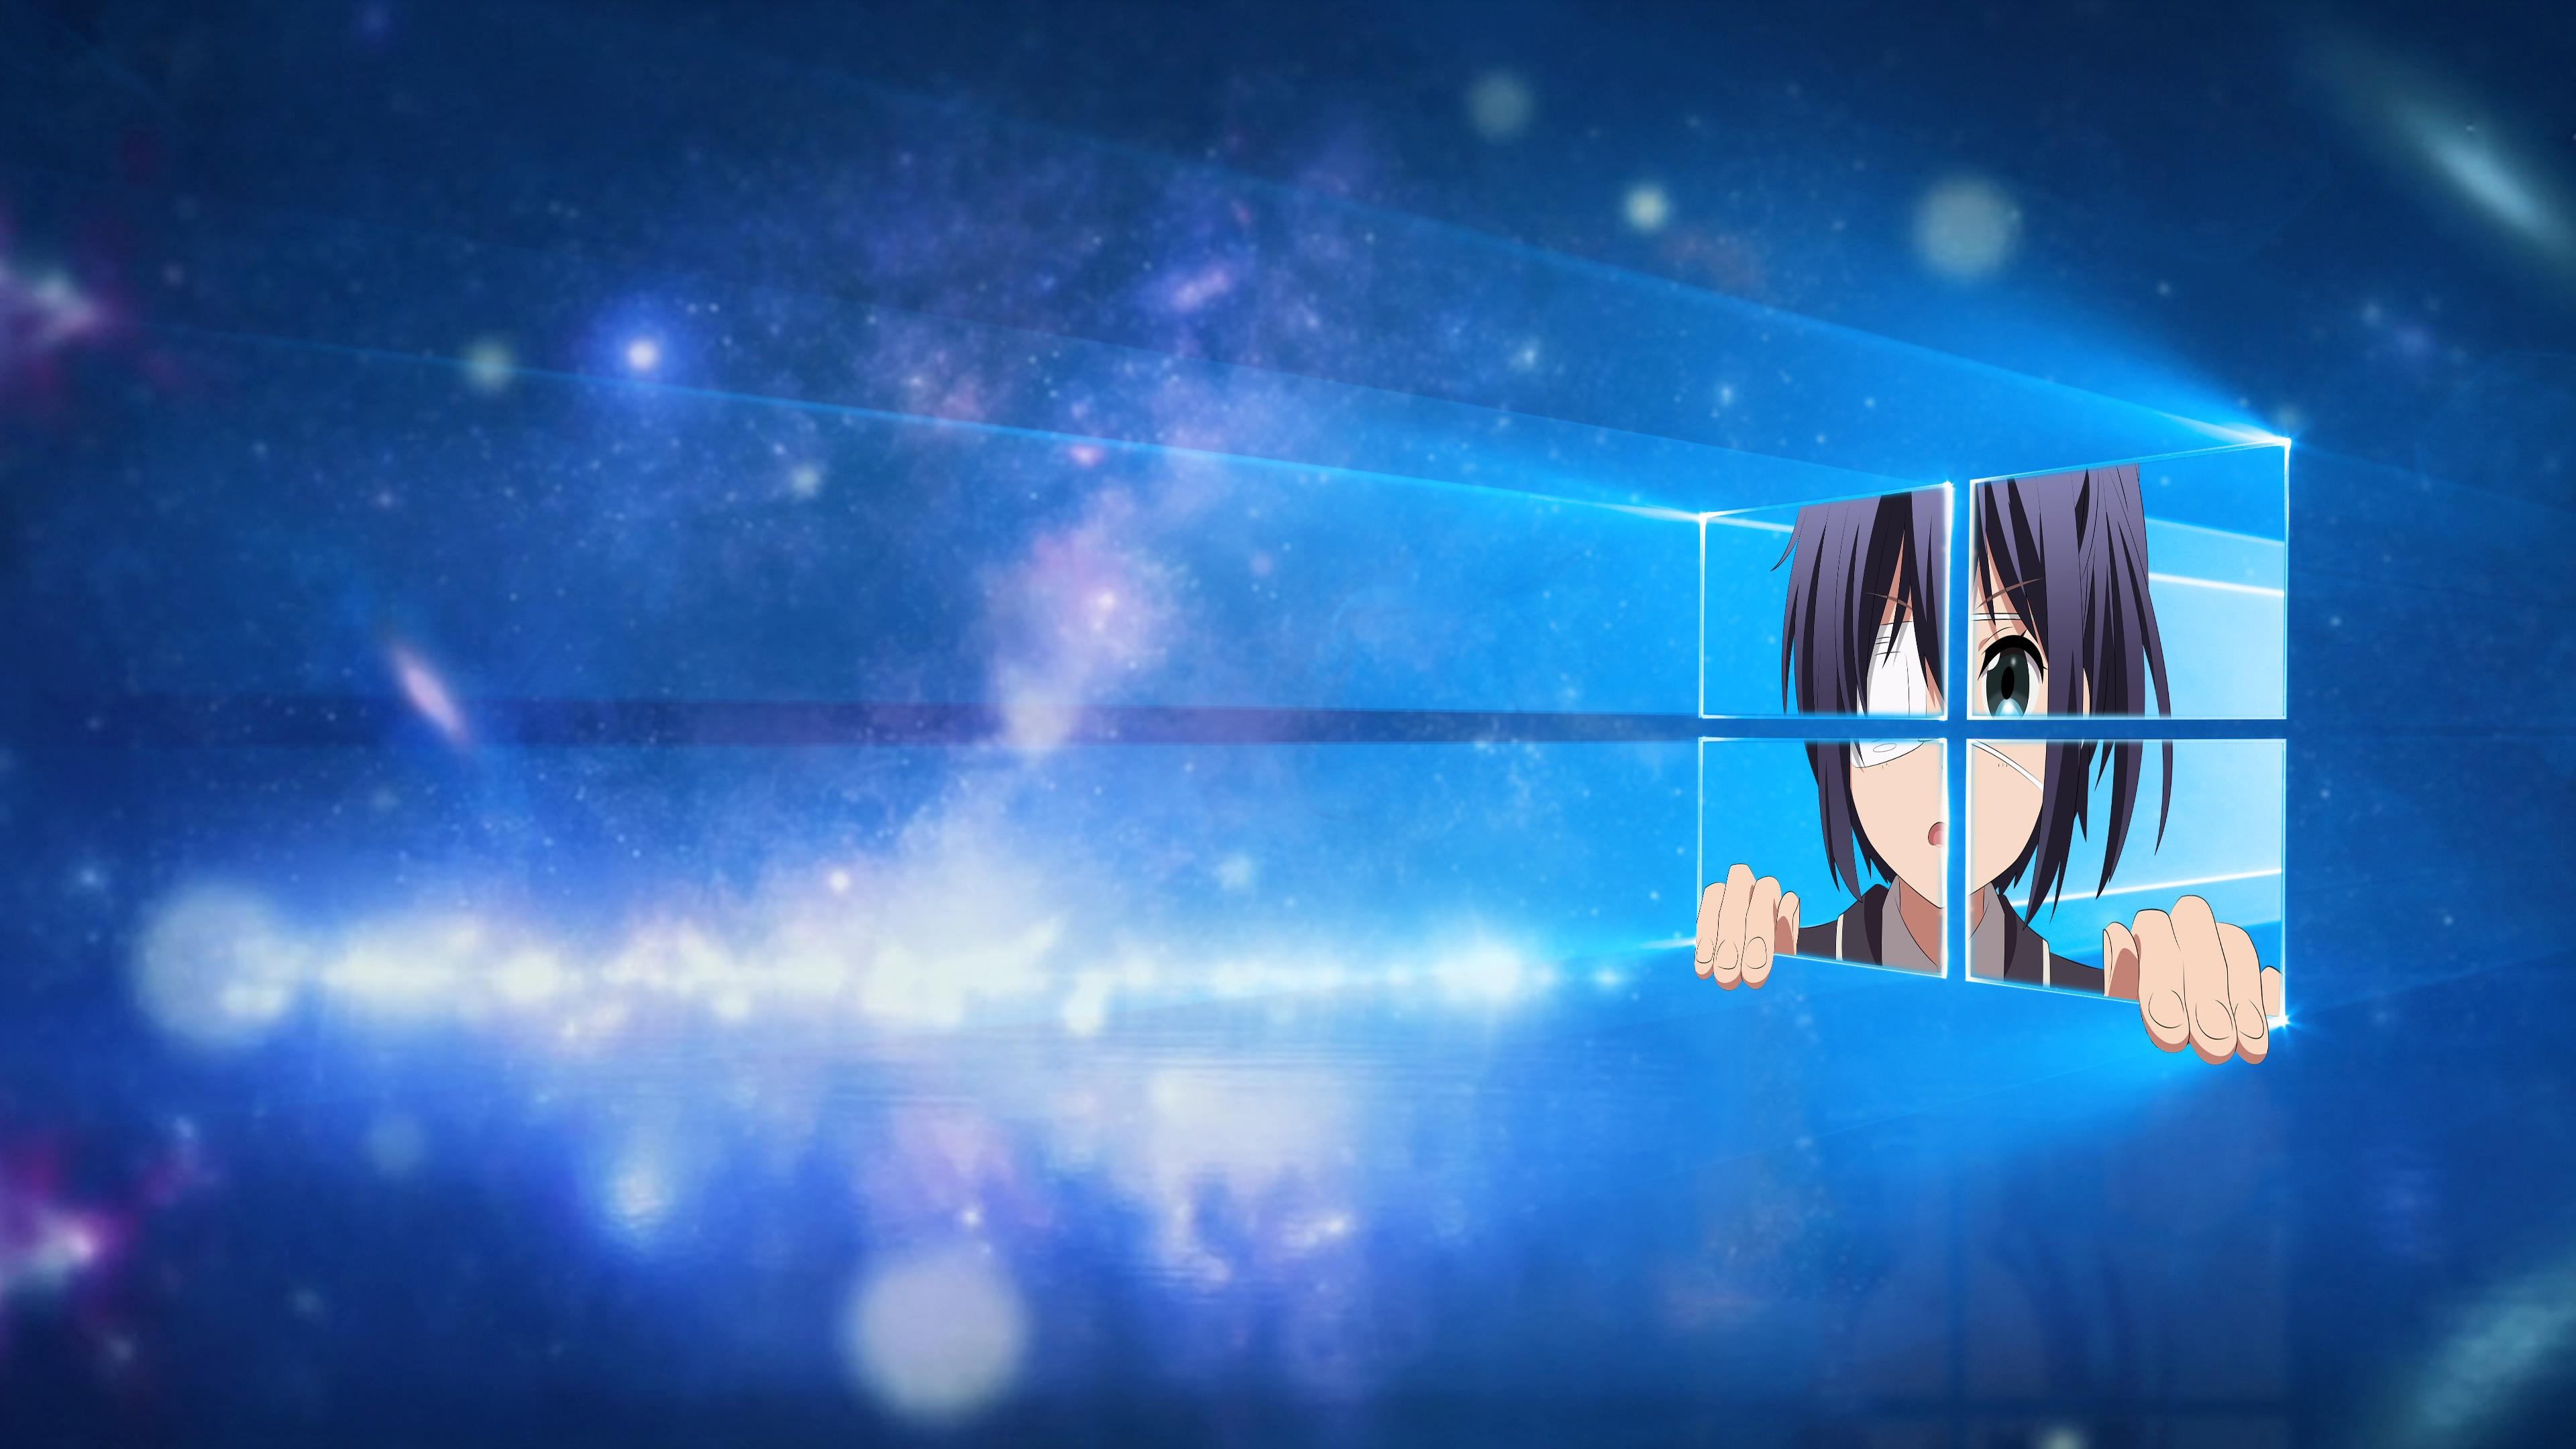 Windows 10 Wallpaper Chuunibyou Style [4k] Animewallpaper 3840x2160